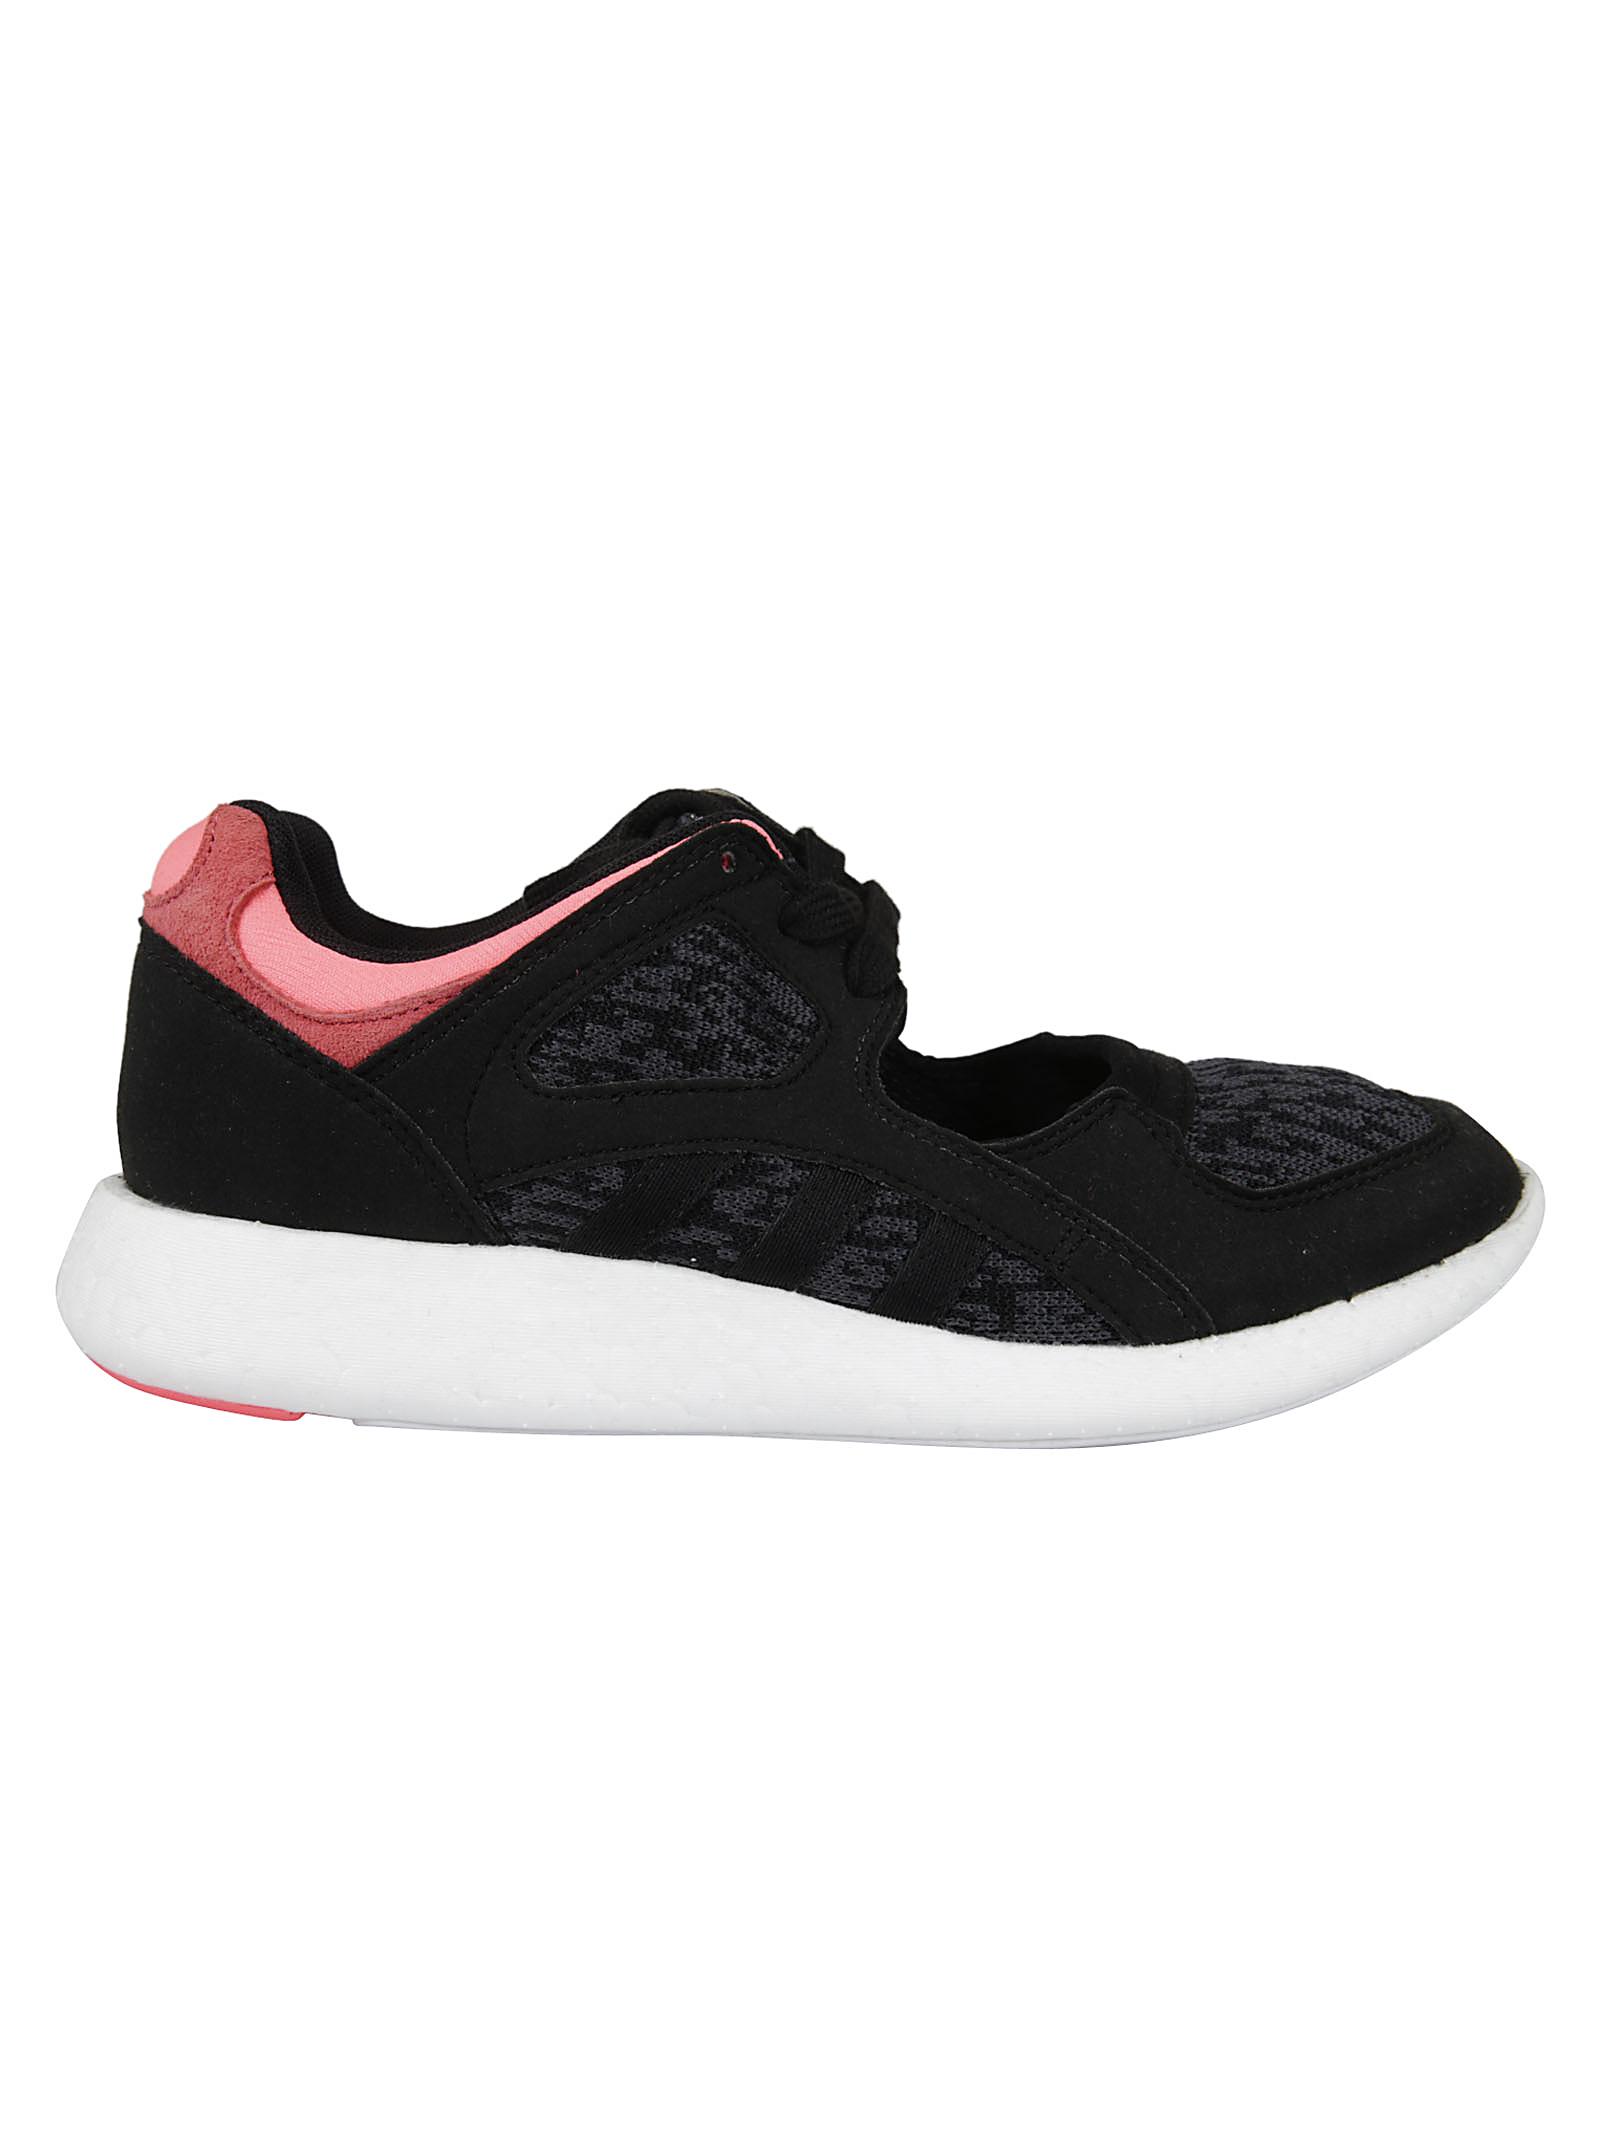 Adidas Adidas EQT Racing 91/16 Sneakers